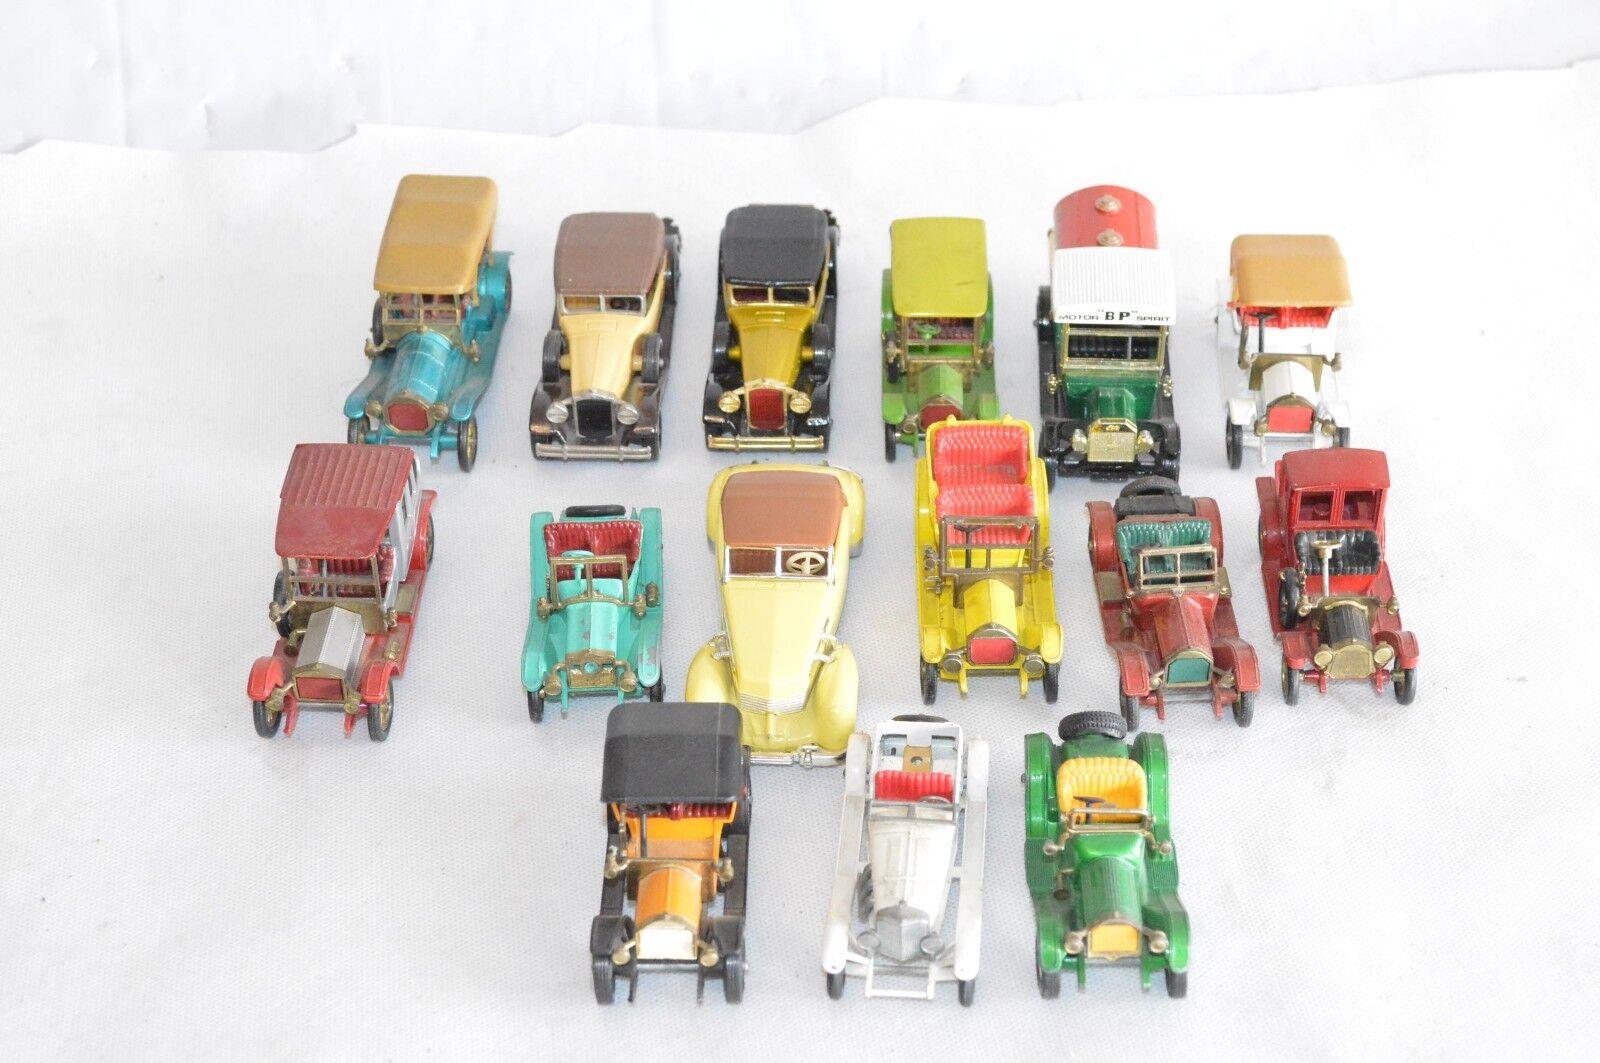 servicio considerado Colección Colección Colección Matchbox models of Yesteryear cualificado e4  clásico atemporal